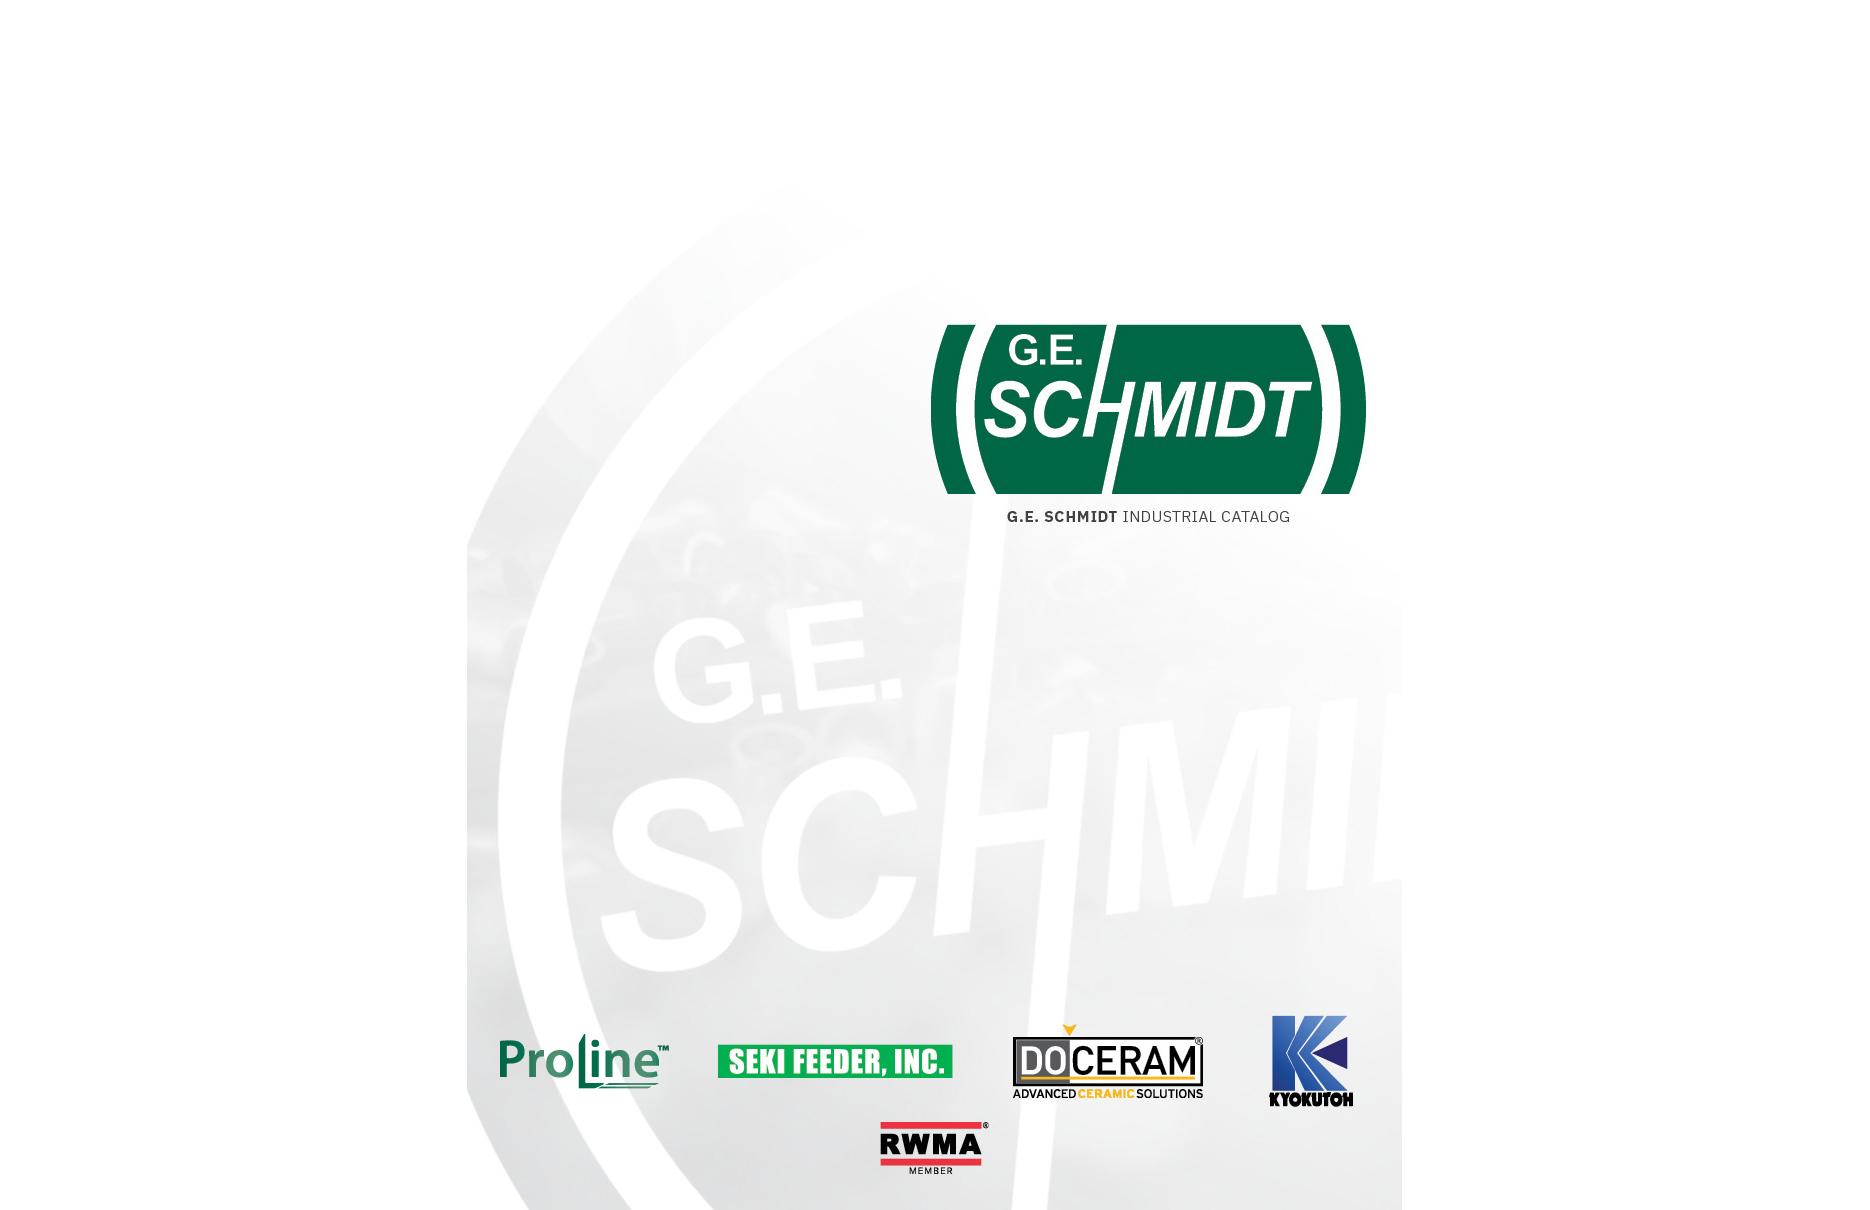 GE Schmidt Catalog Cover